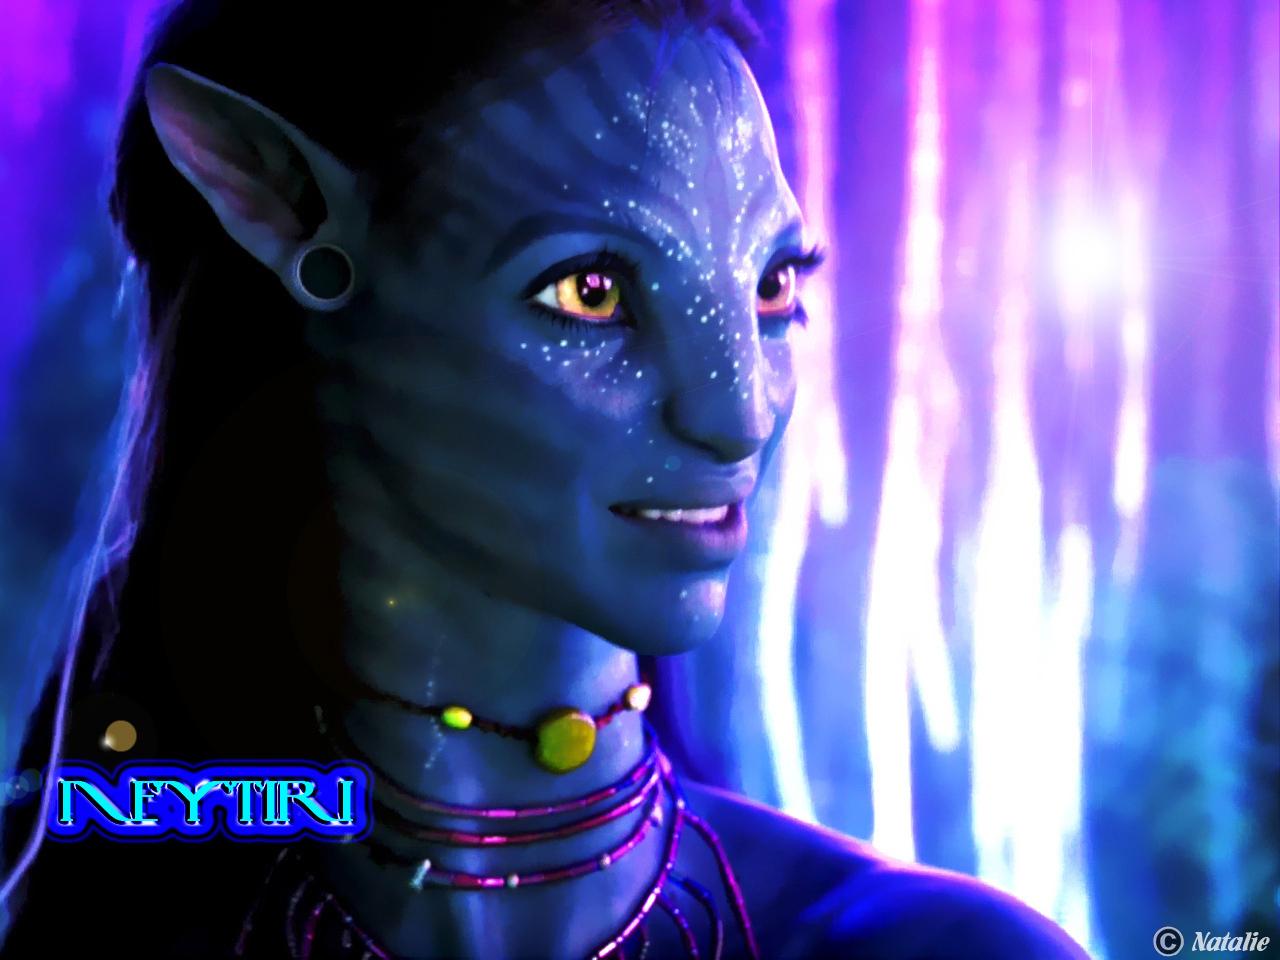 Neytiri-avatar-11001197-1280-960